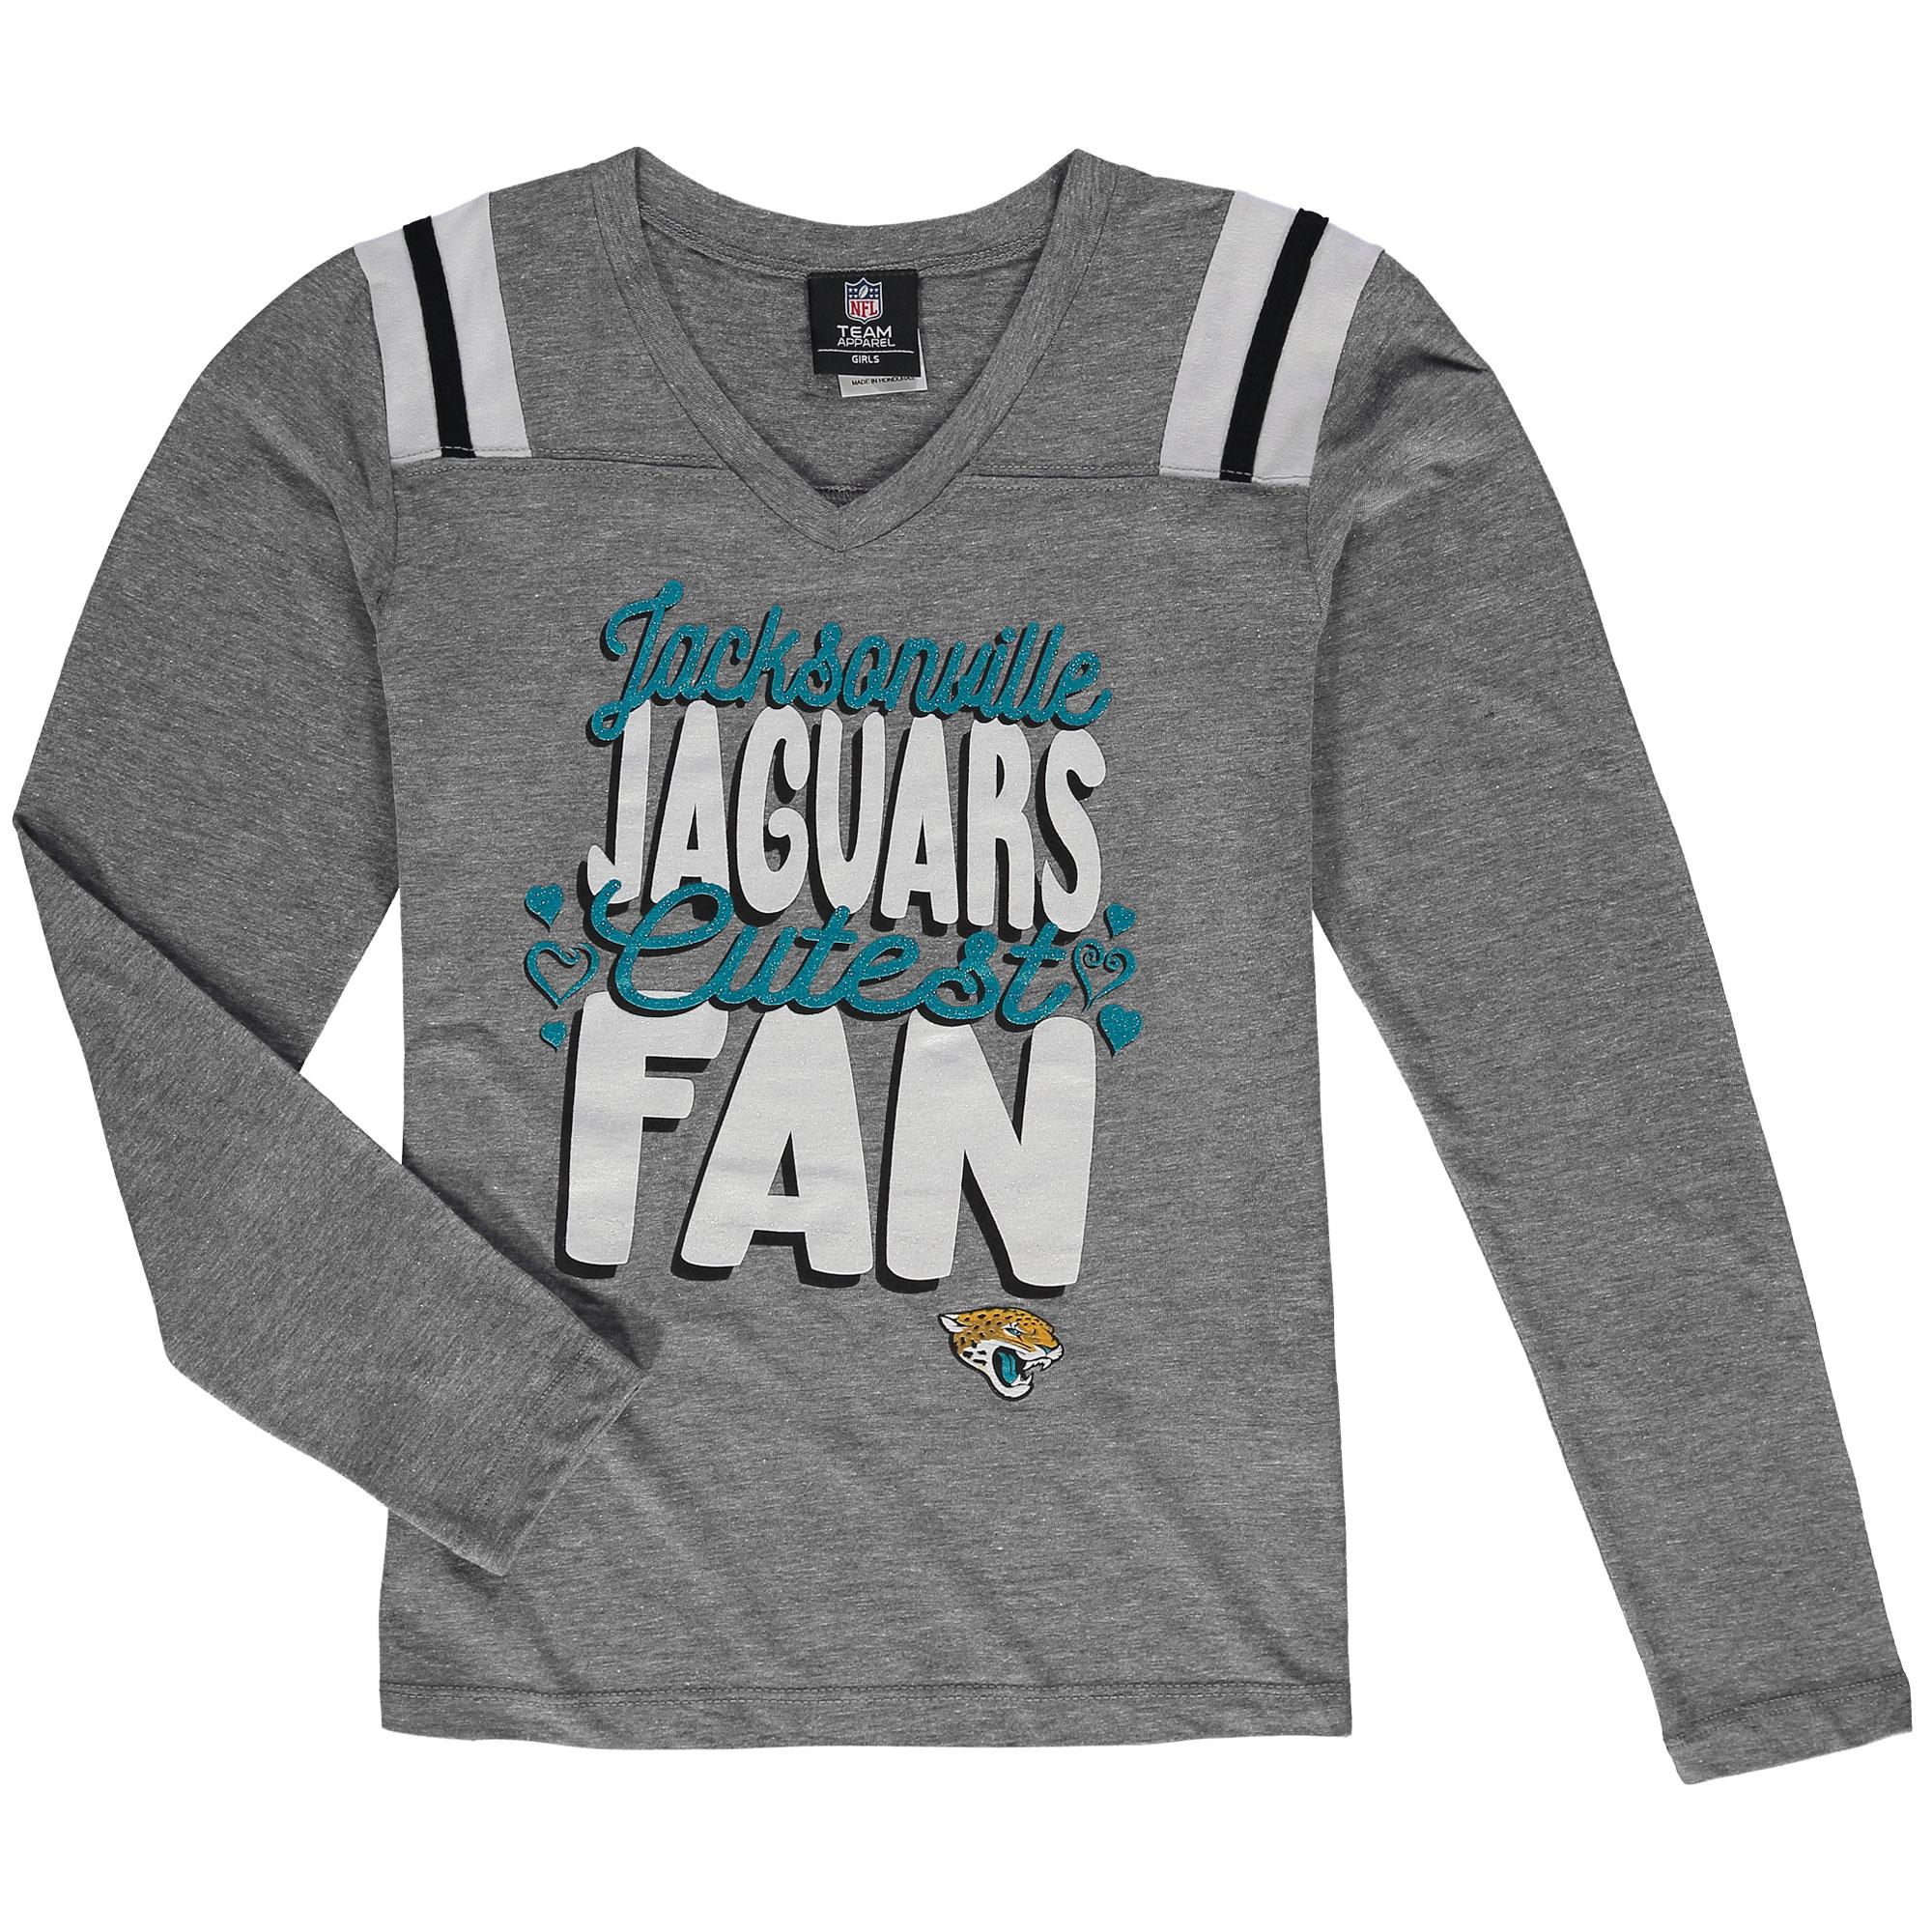 Jacksonville Jaguars 5th & Ocean by New Era Girls Youth Cutest Fan Tri-Blend V-Neck Long Sleeve T-Shirt - Heathered Gray